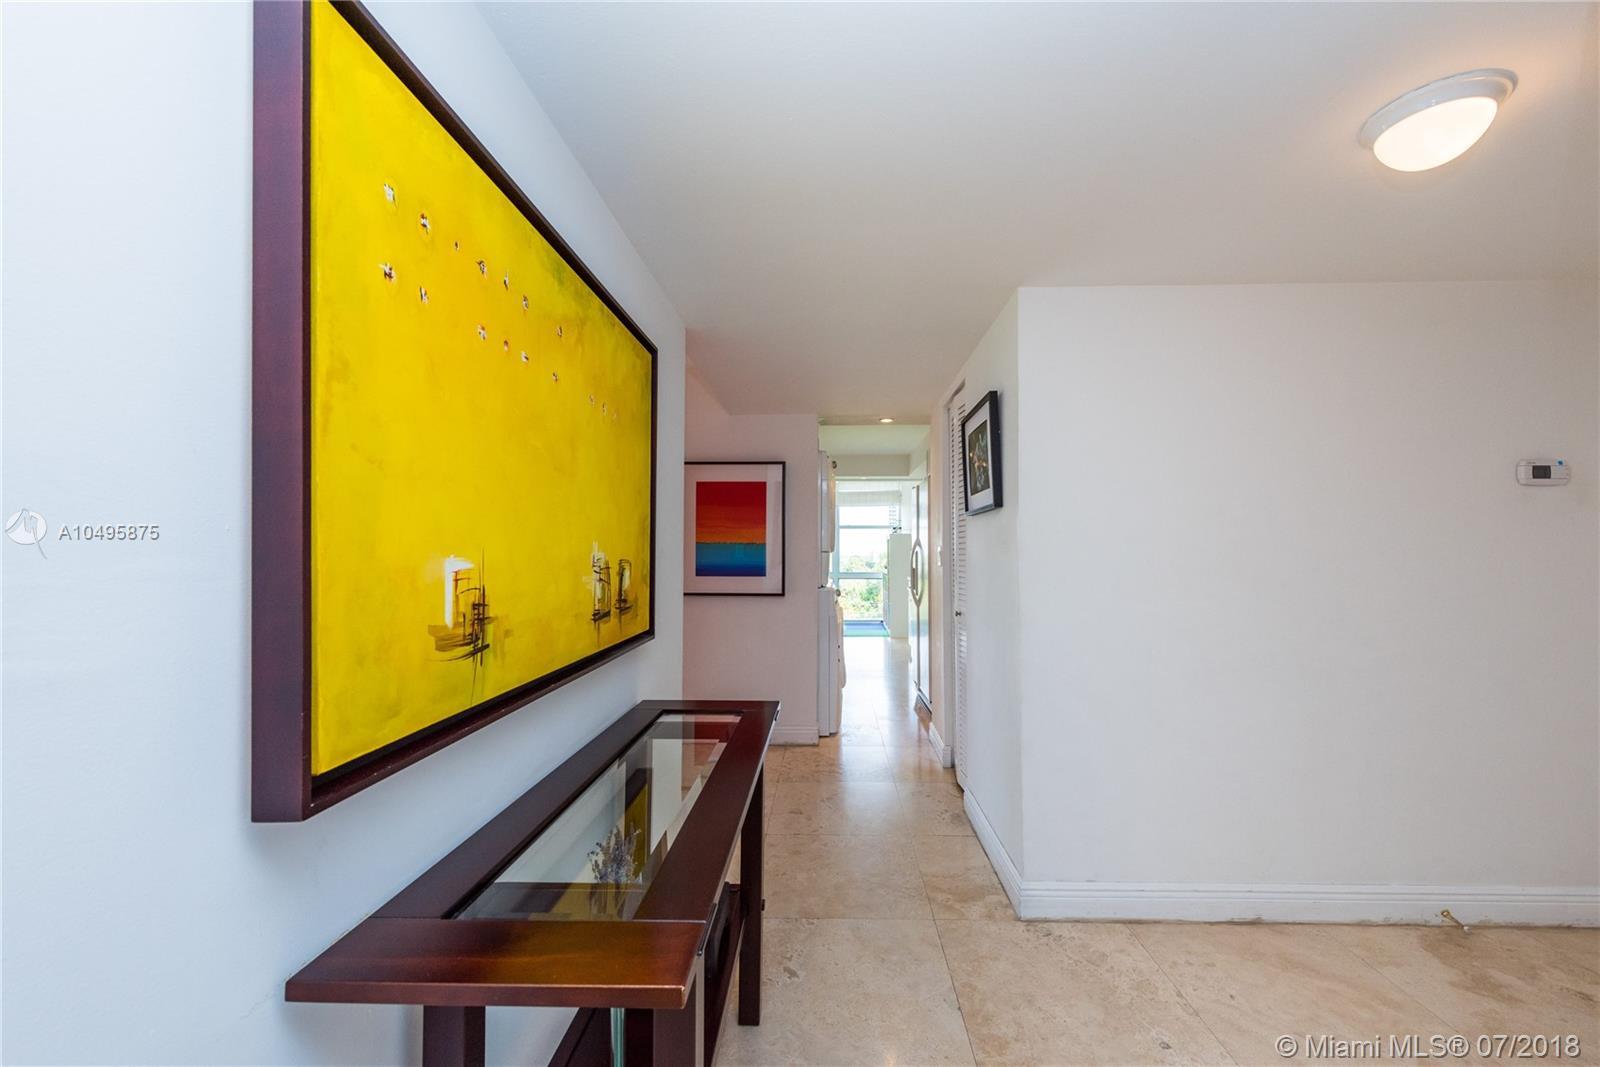 1901 Brickell Ave, Miami. FL 33129, Brickell Place I #B808, Brickell, Miami A10495875 image #17